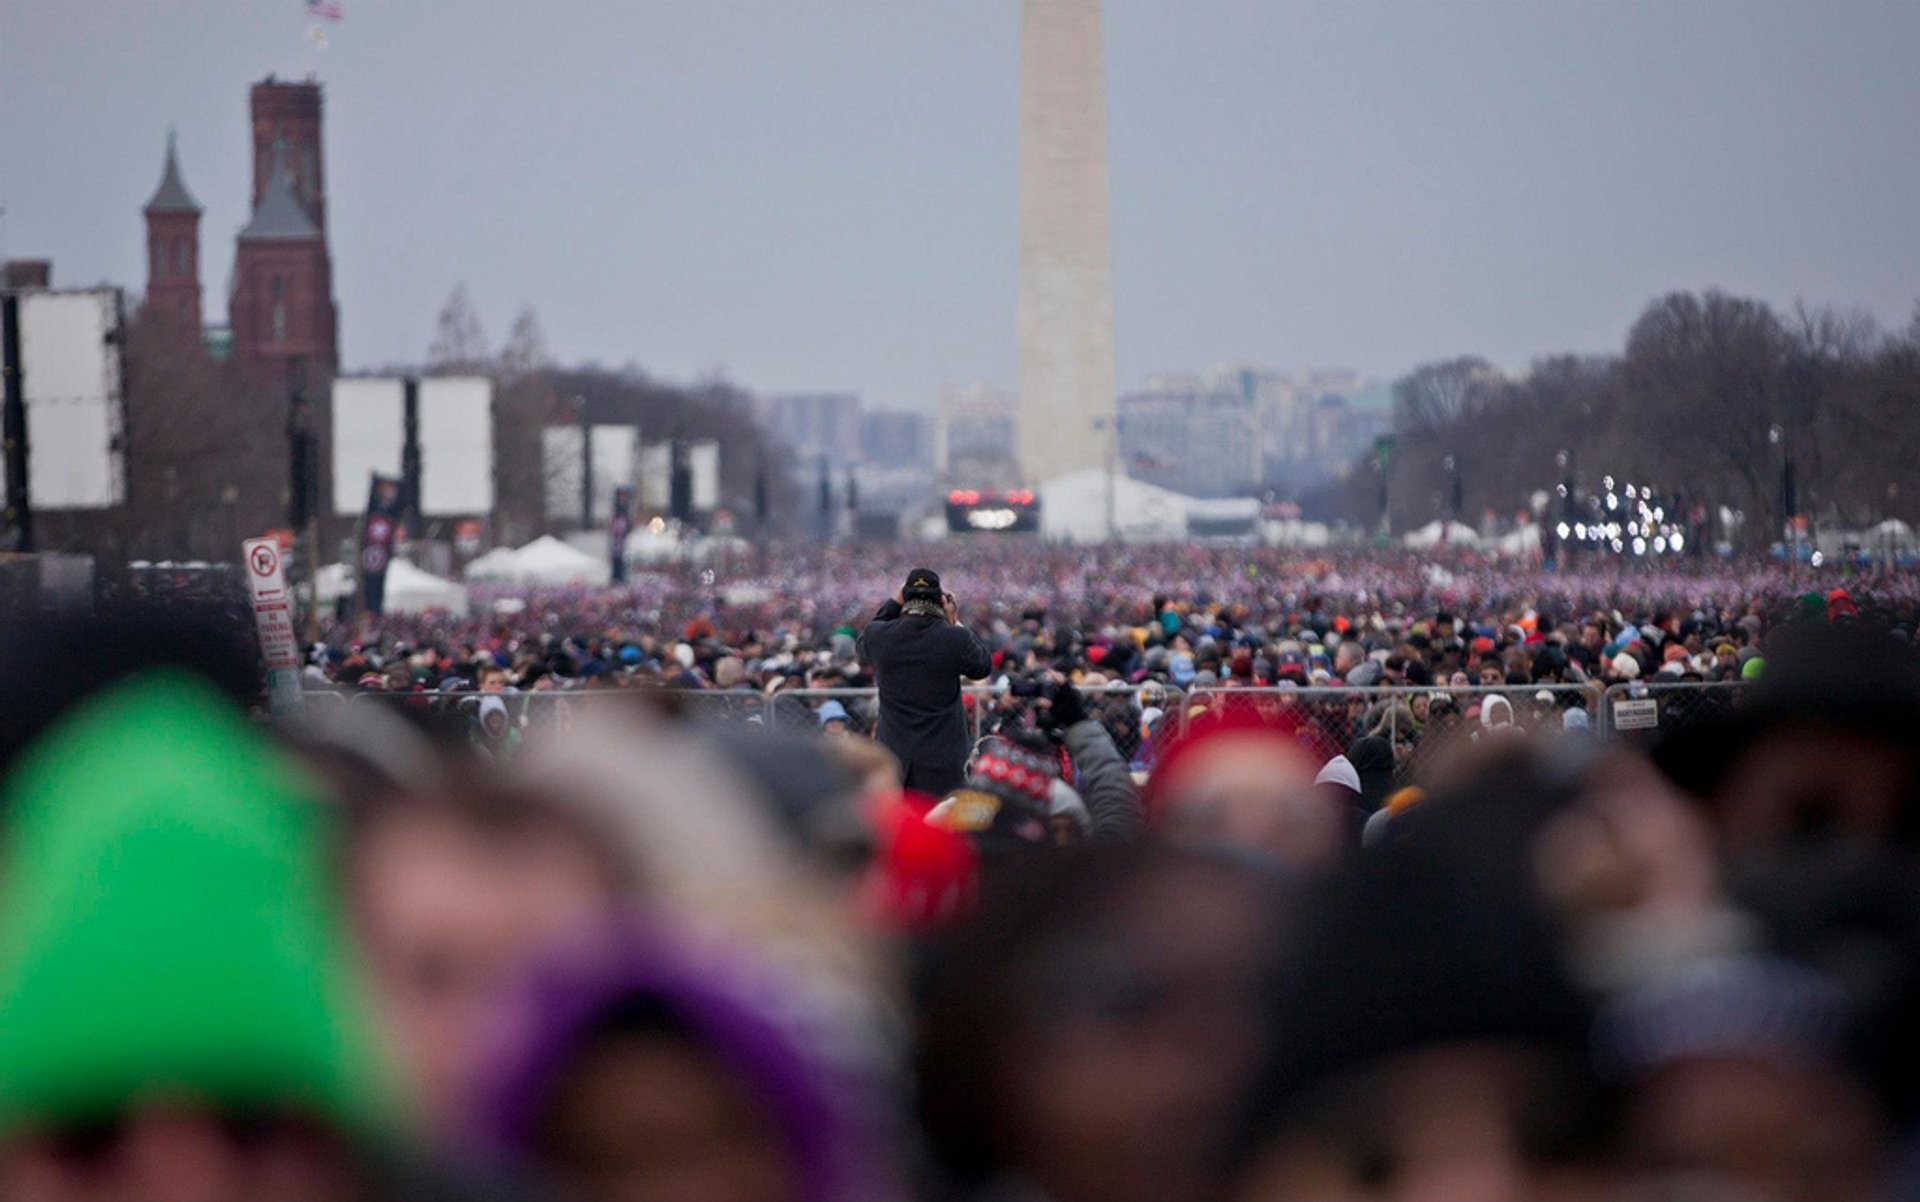 Presidential Inauguration in Washington, D.C. - Best Season 2019